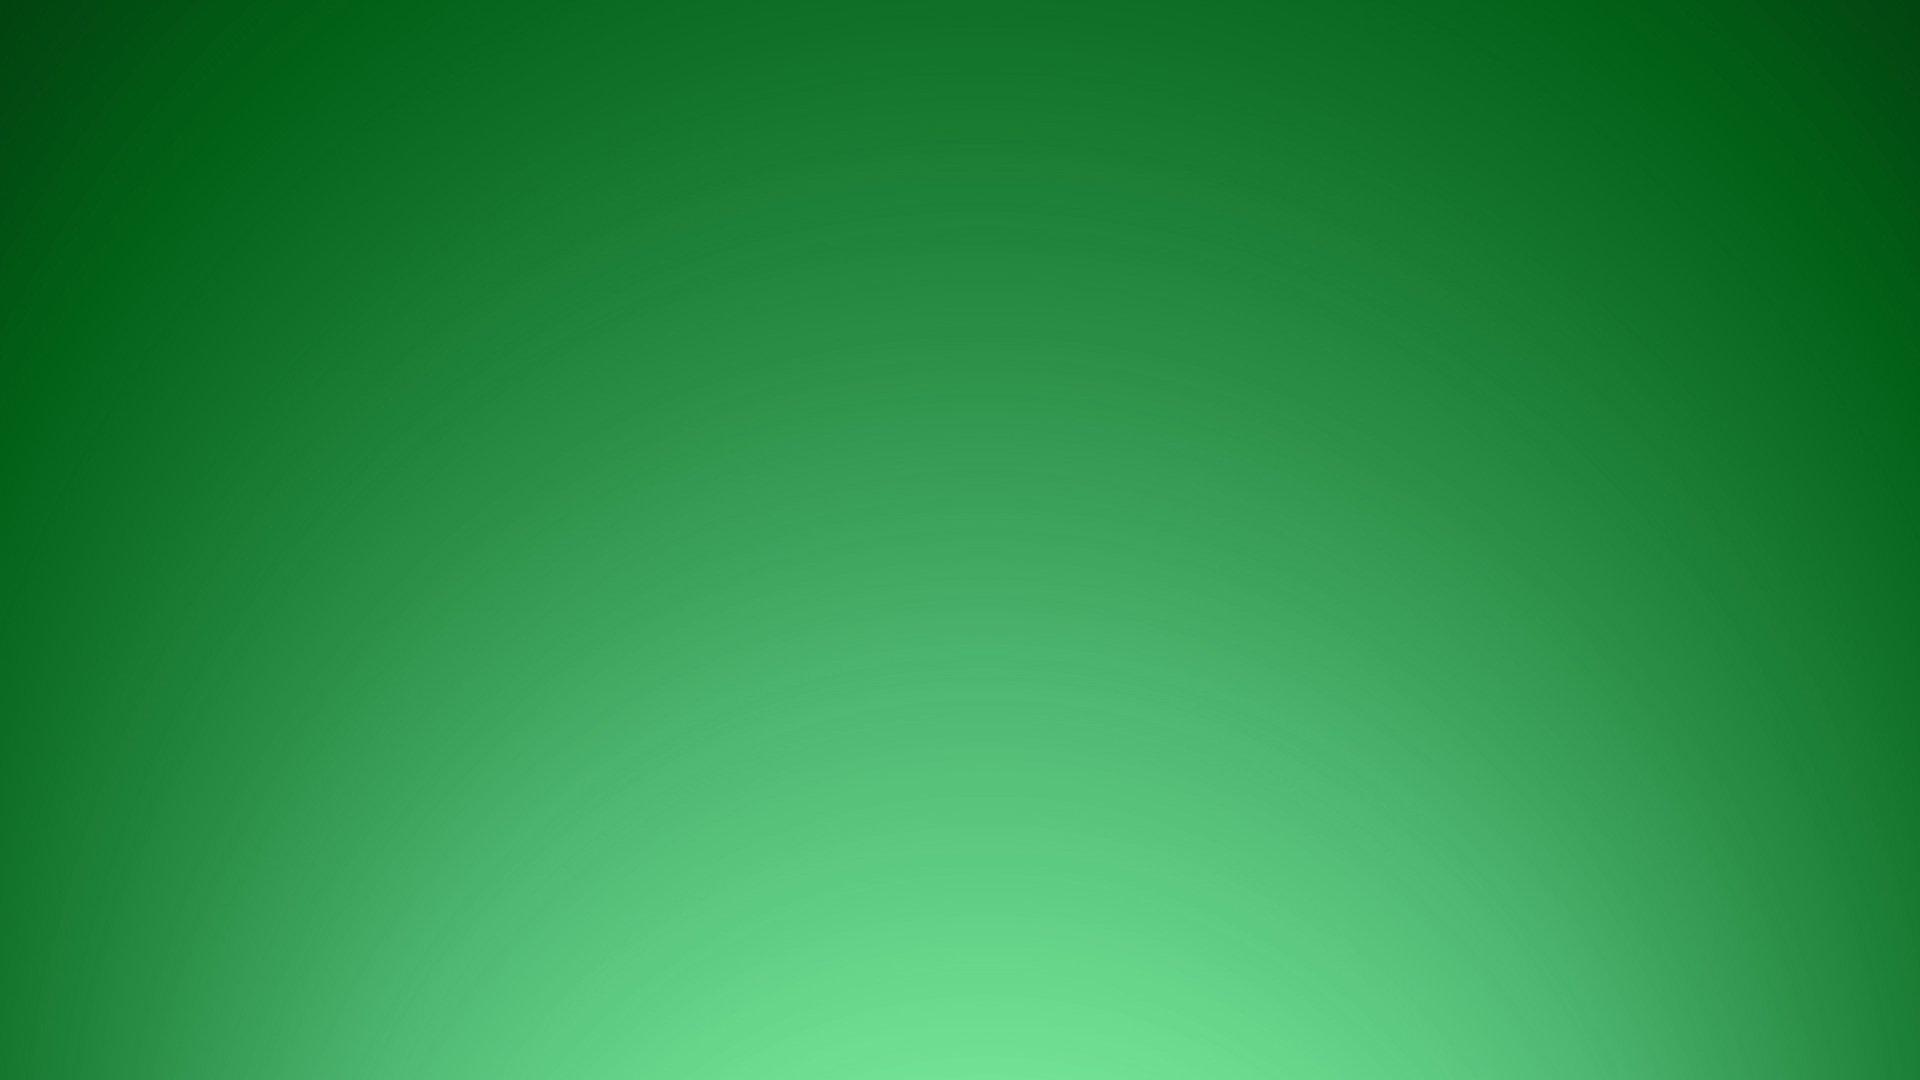 Glow Neon Green Background - HD Wallpaper